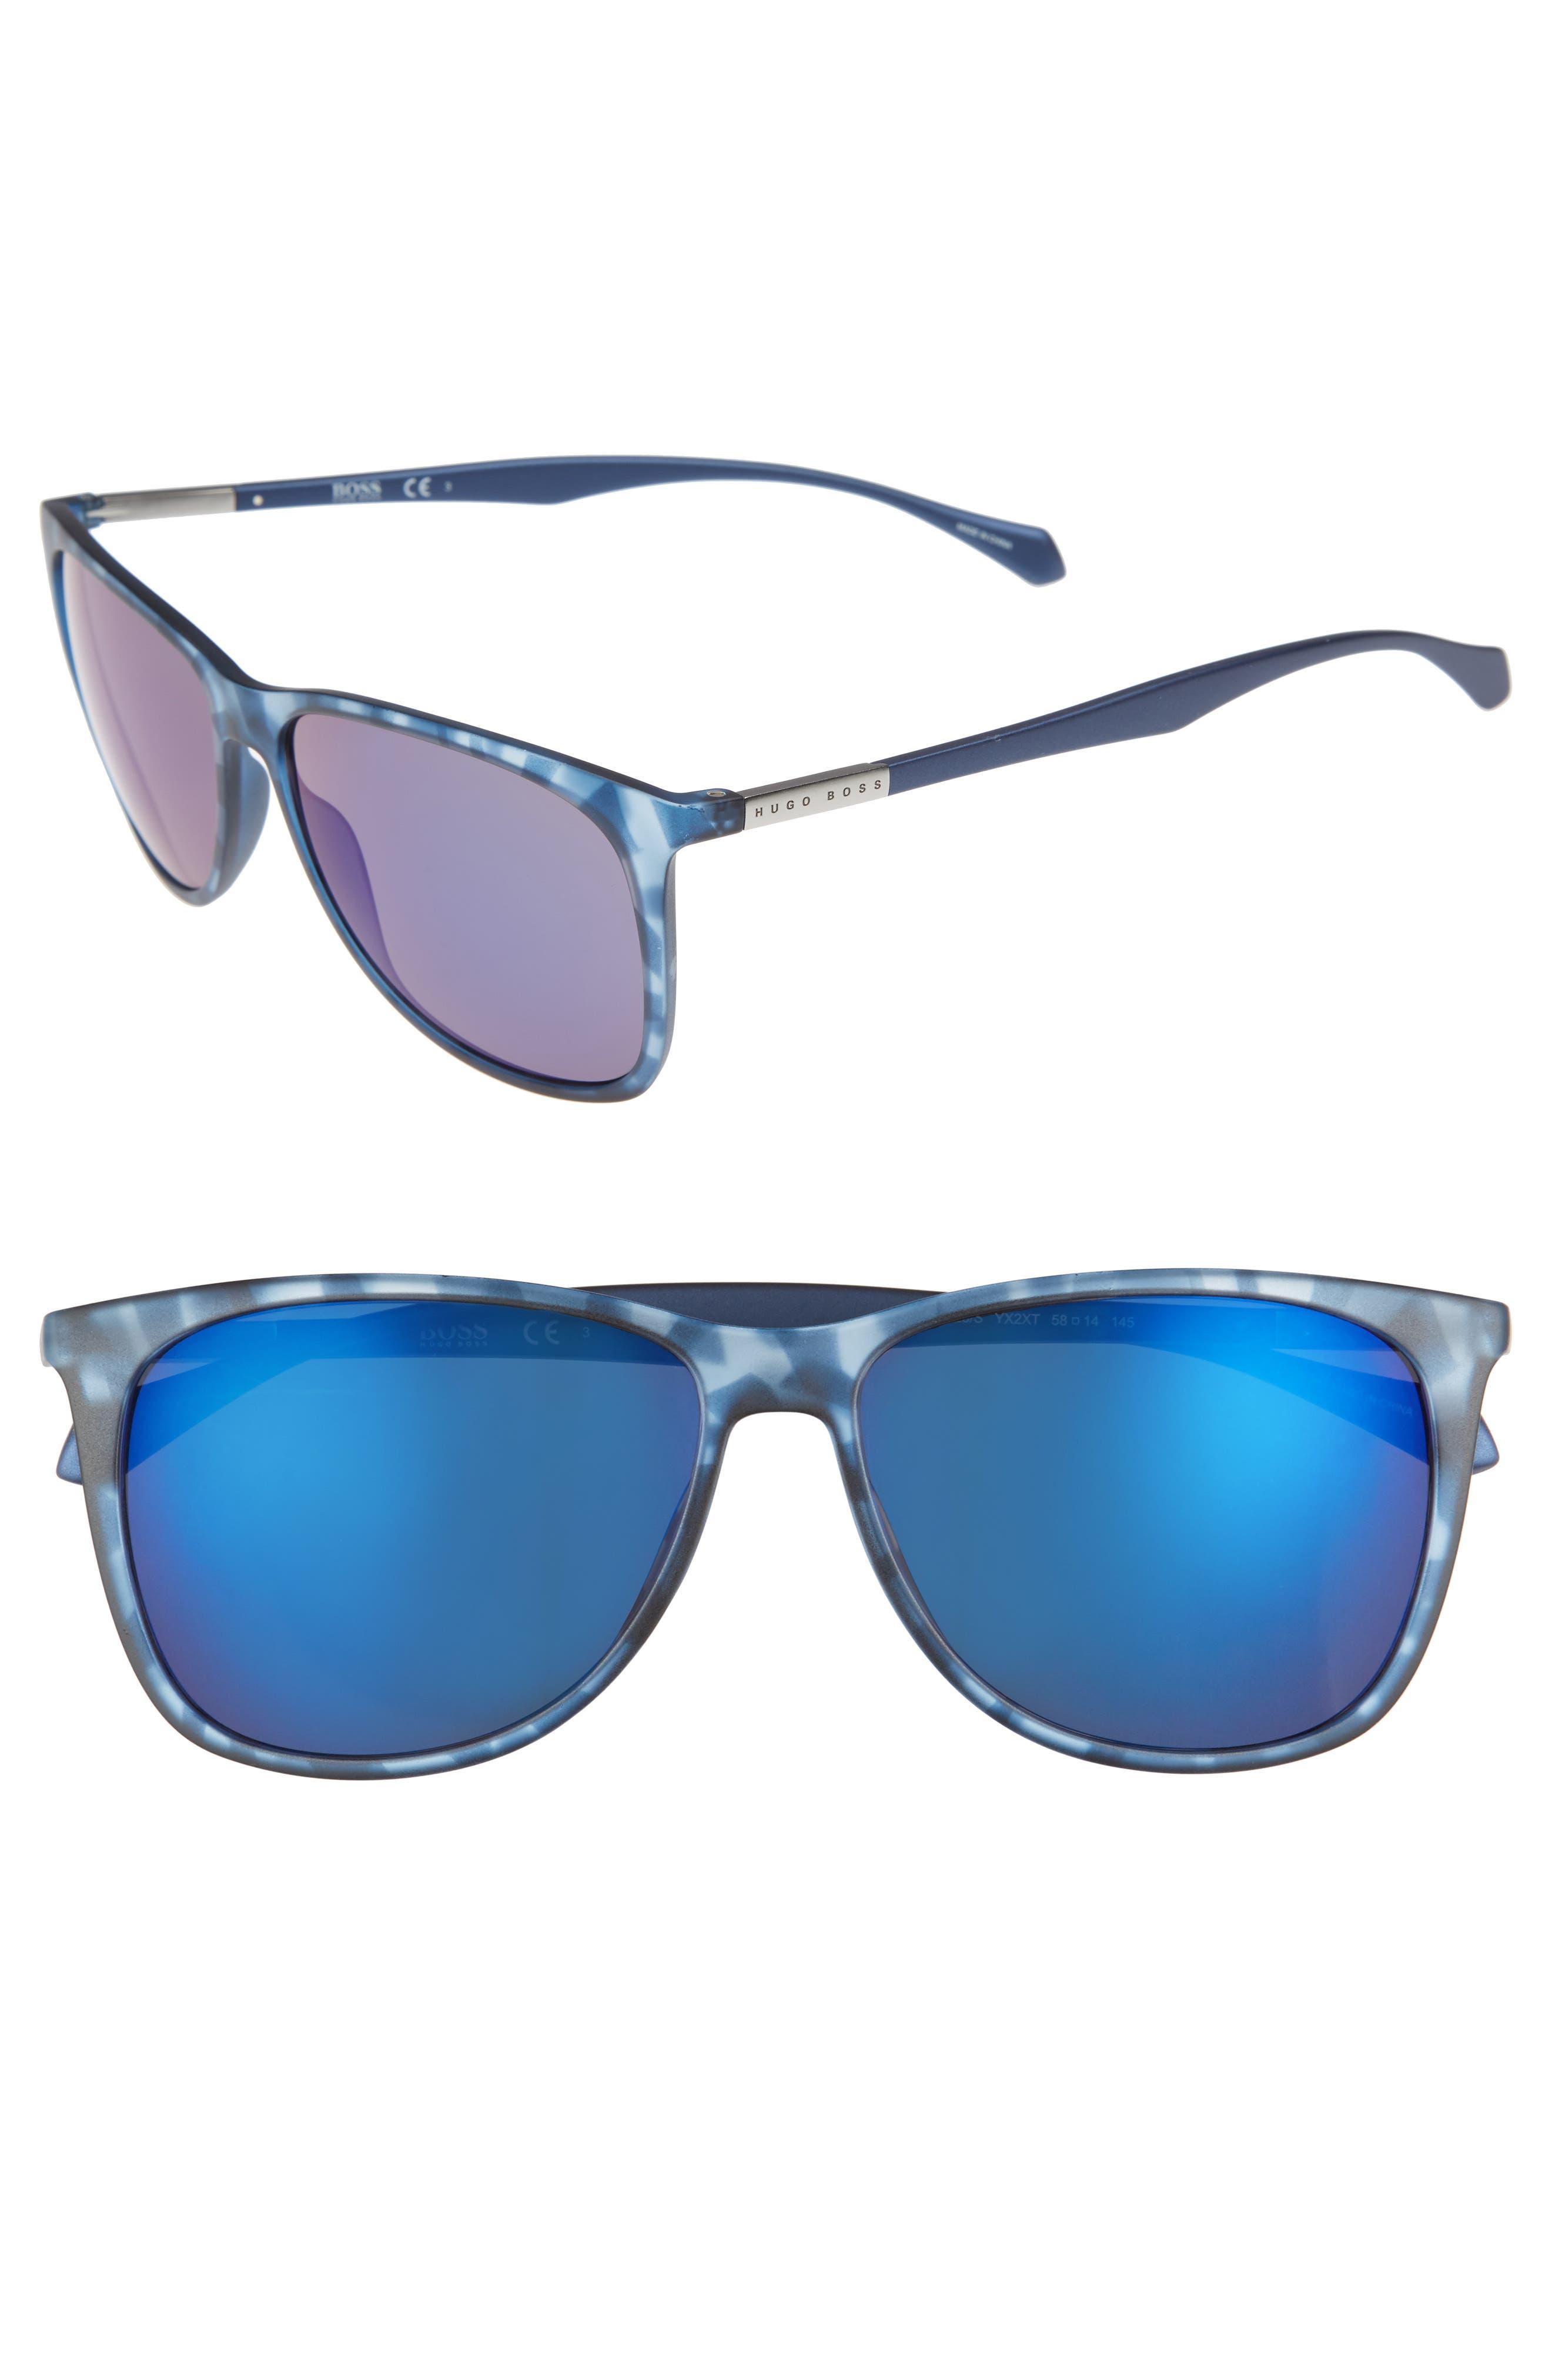 58mm Sunglasses,                             Main thumbnail 1, color,                             Blue Havana/ Blue Sky